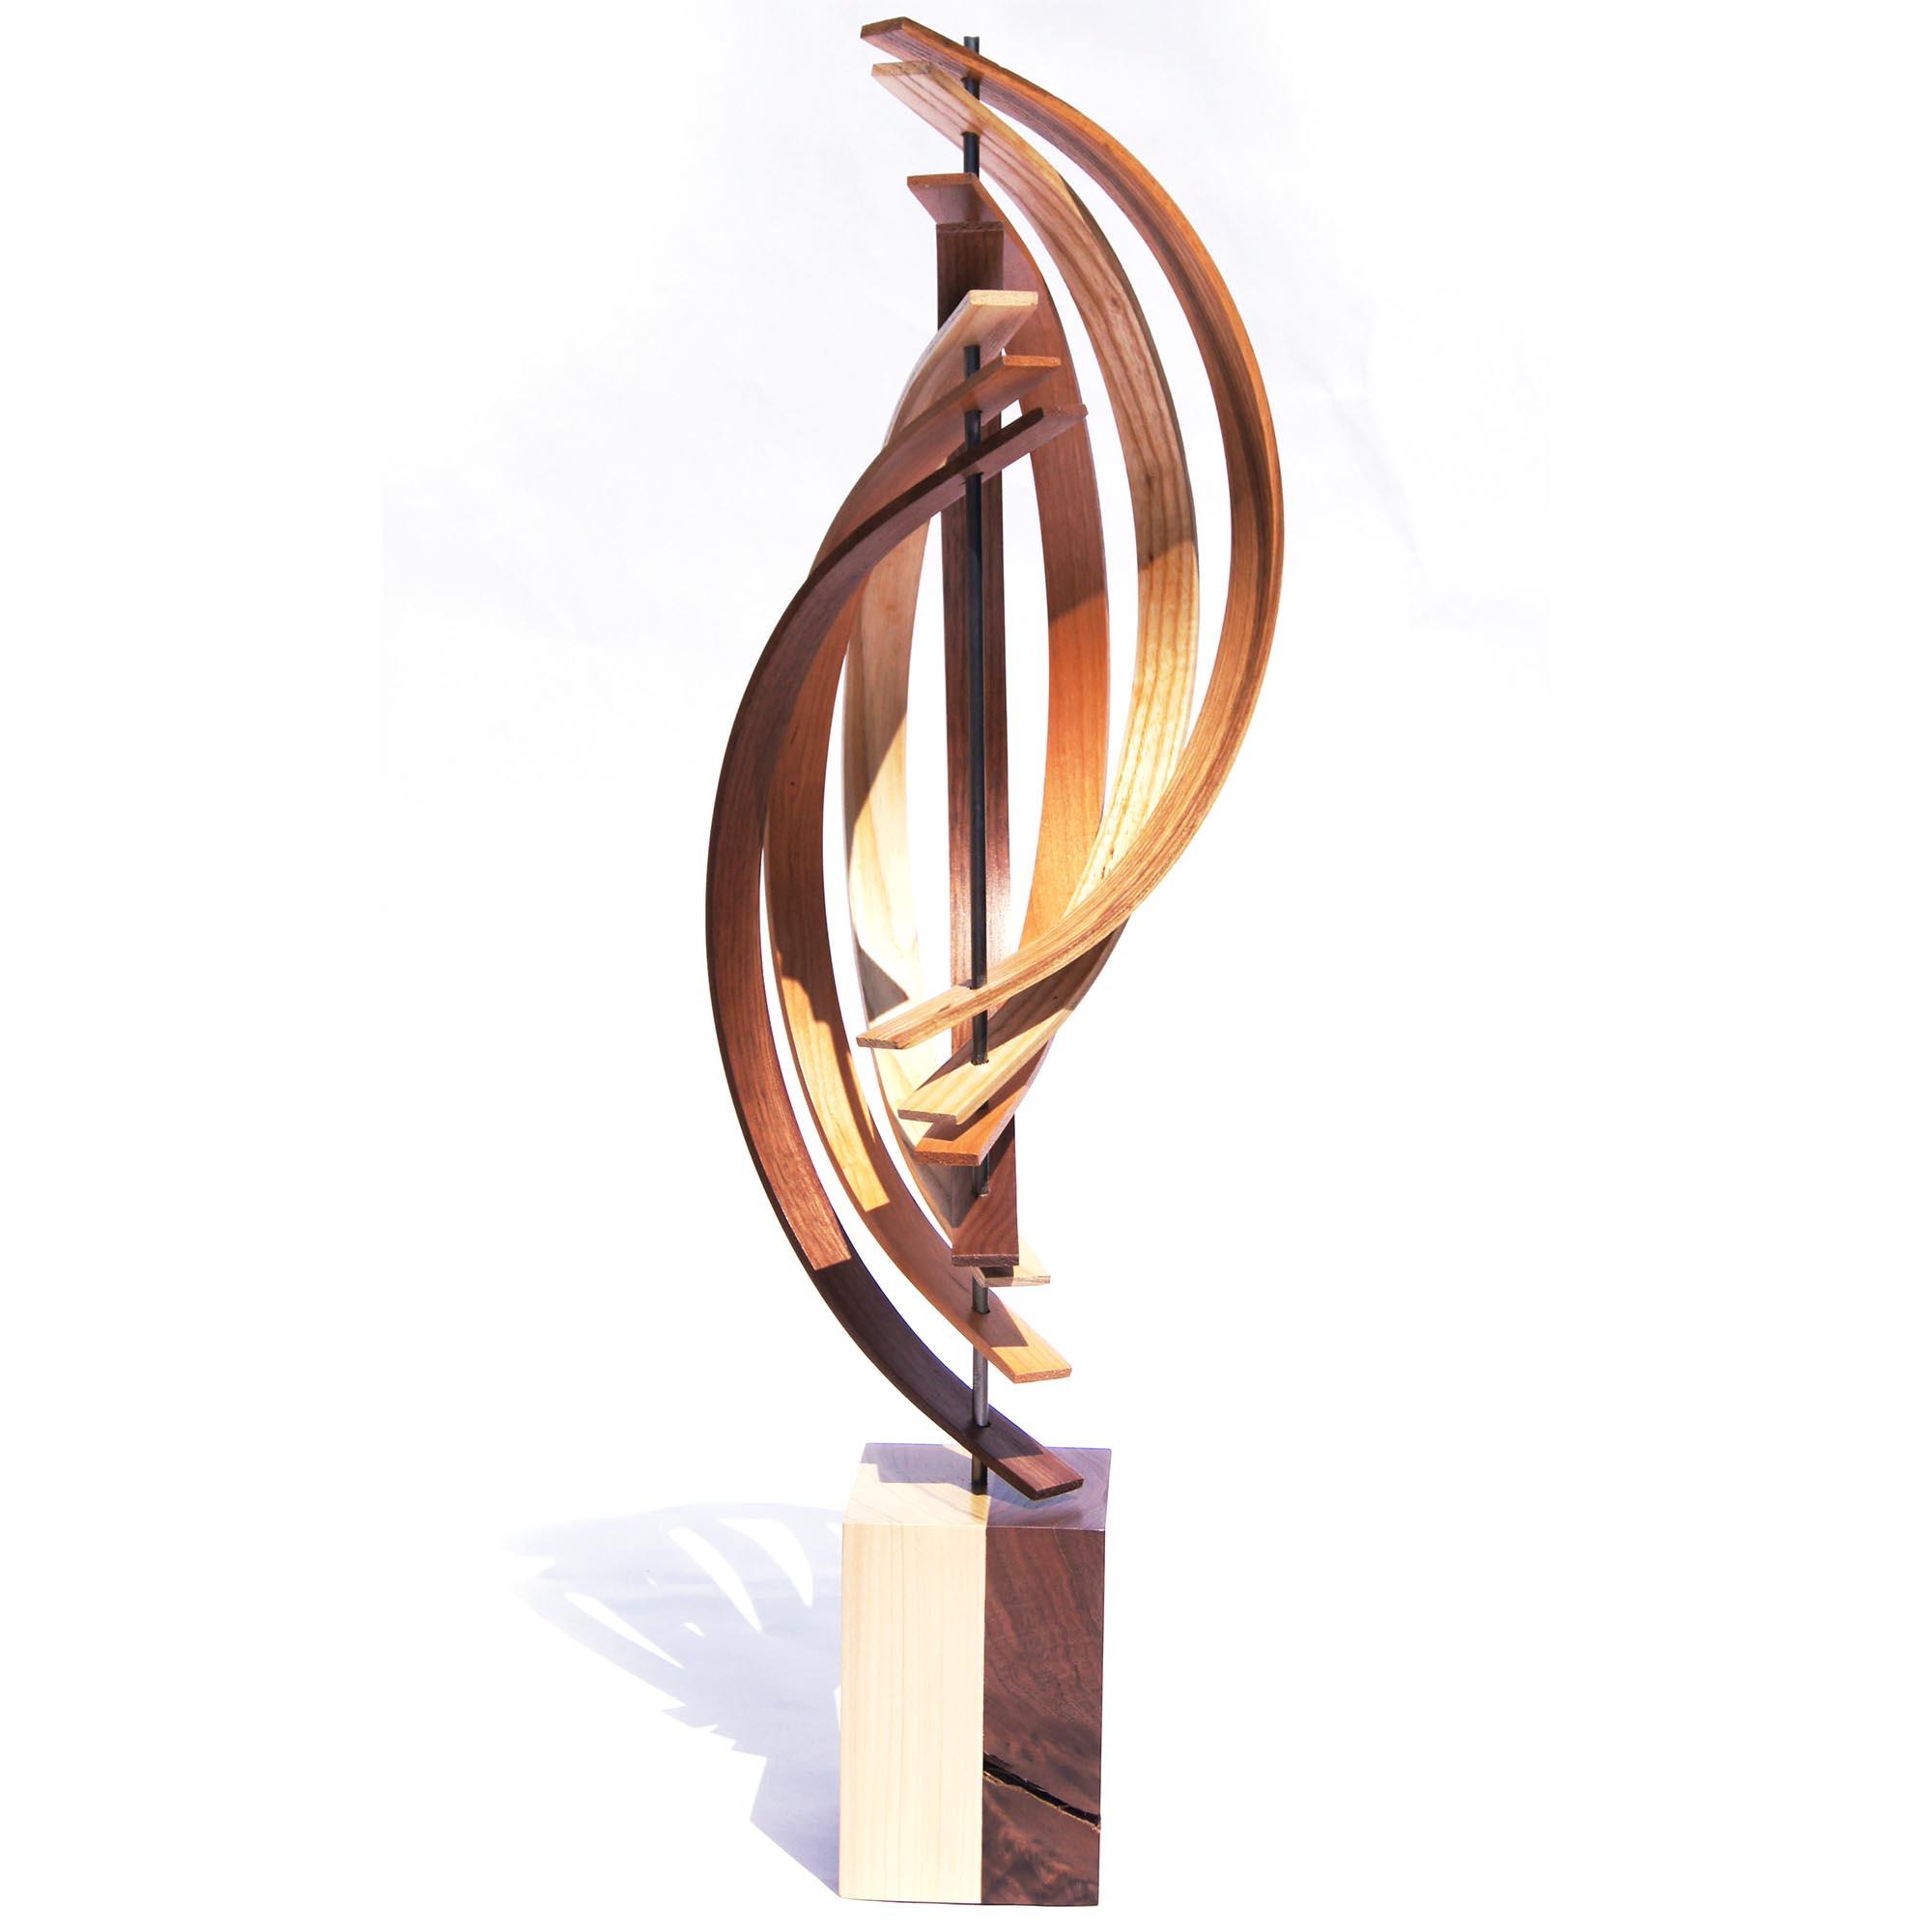 The Climb by Jeff Linenkugel - Modern Wood Sculpture on Natural Wood - Image 2